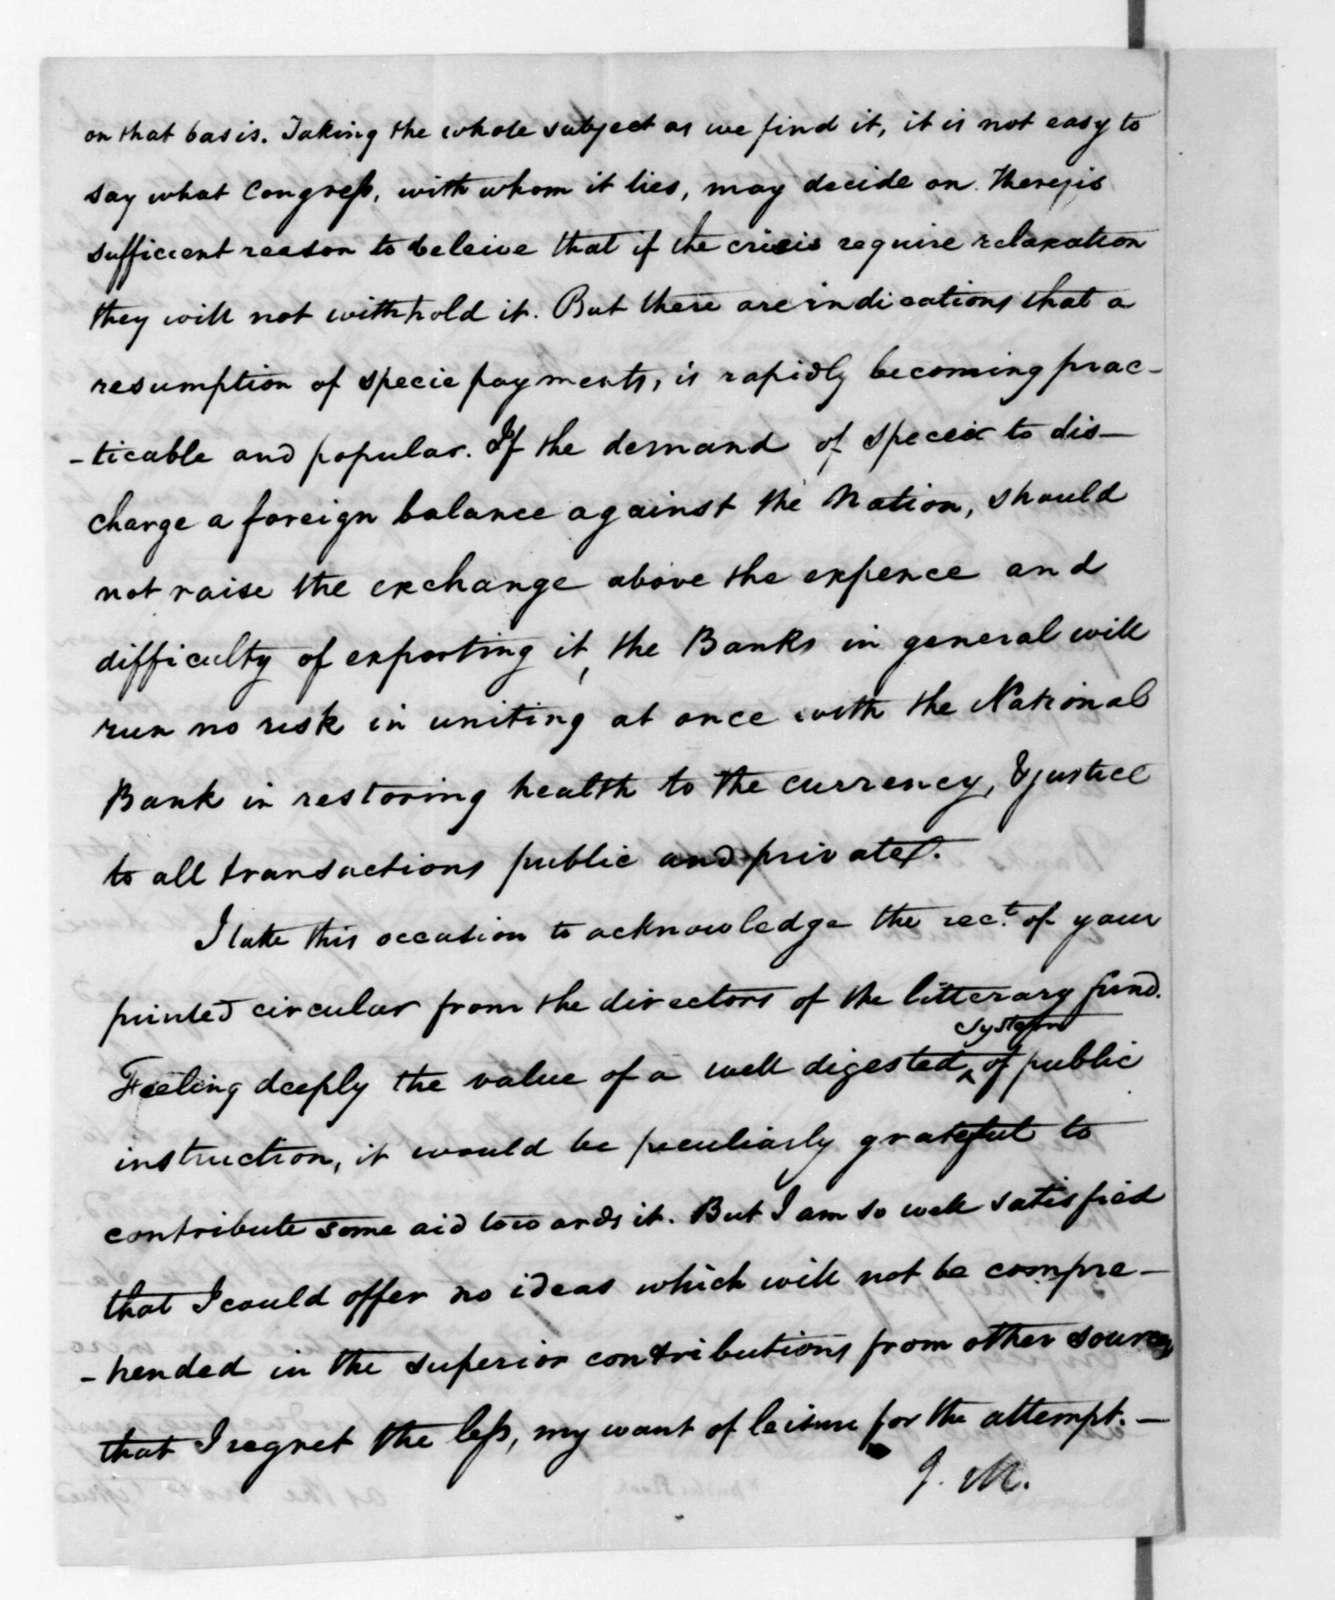 James Madison to Wilson Cary Nicholas, October 5, 1816.